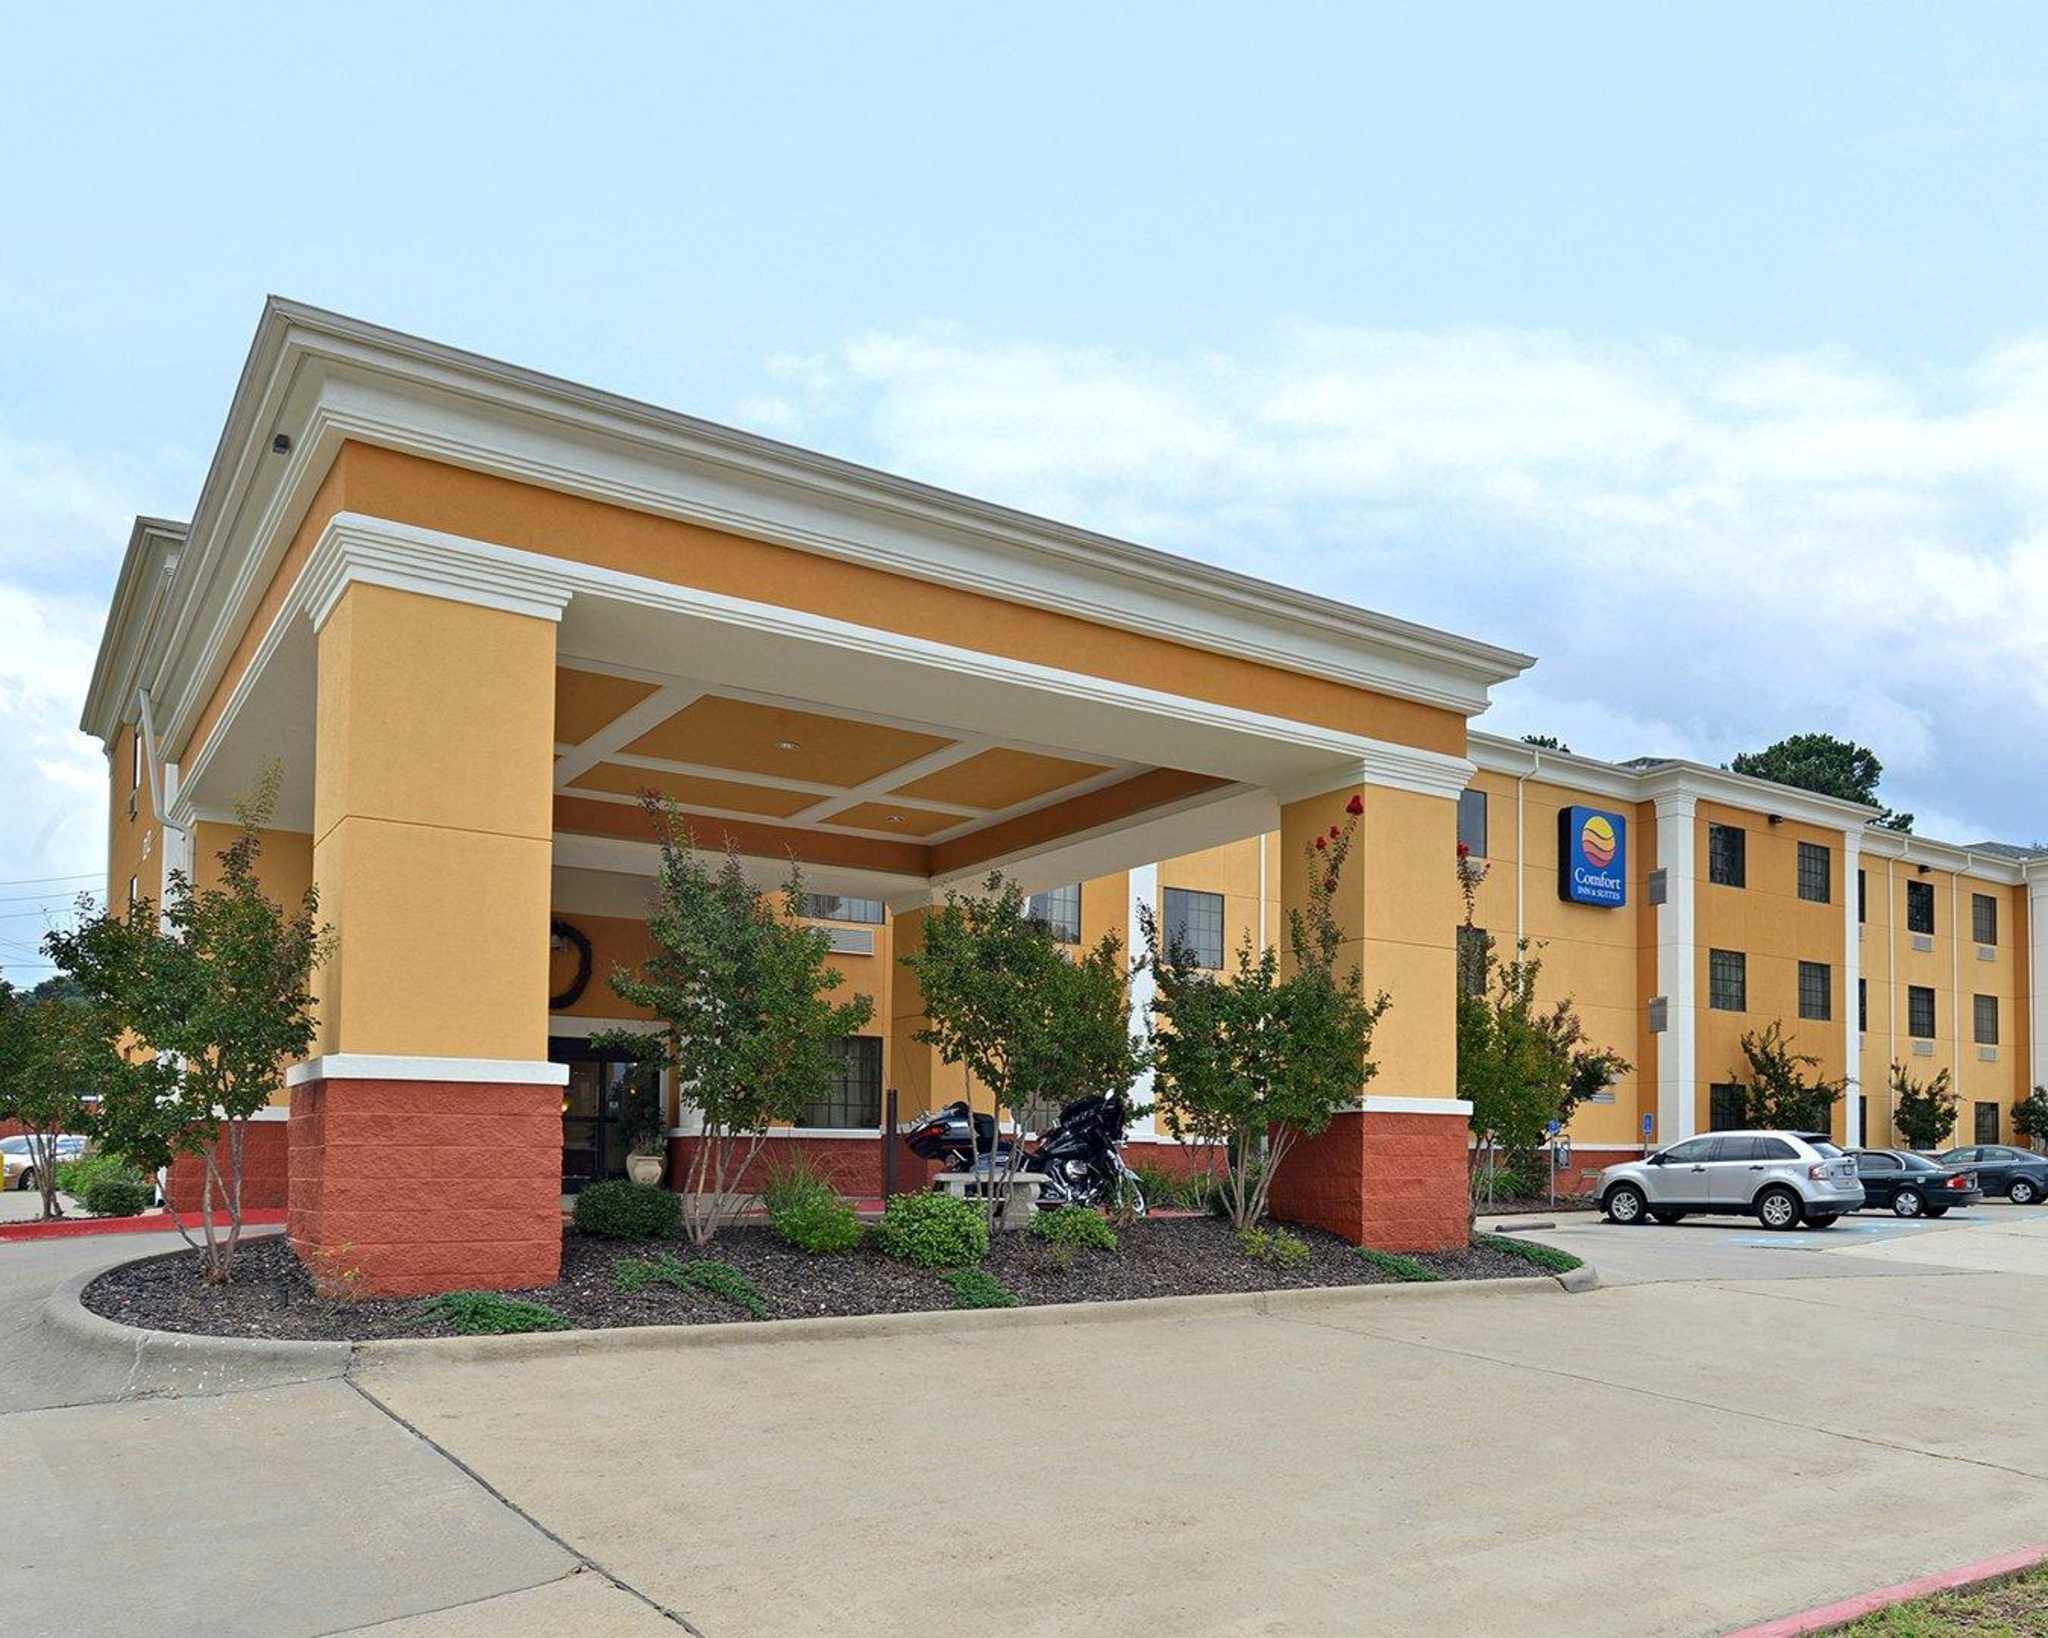 Comfort Inn Amp Suites El Dorado Ar Business Directory